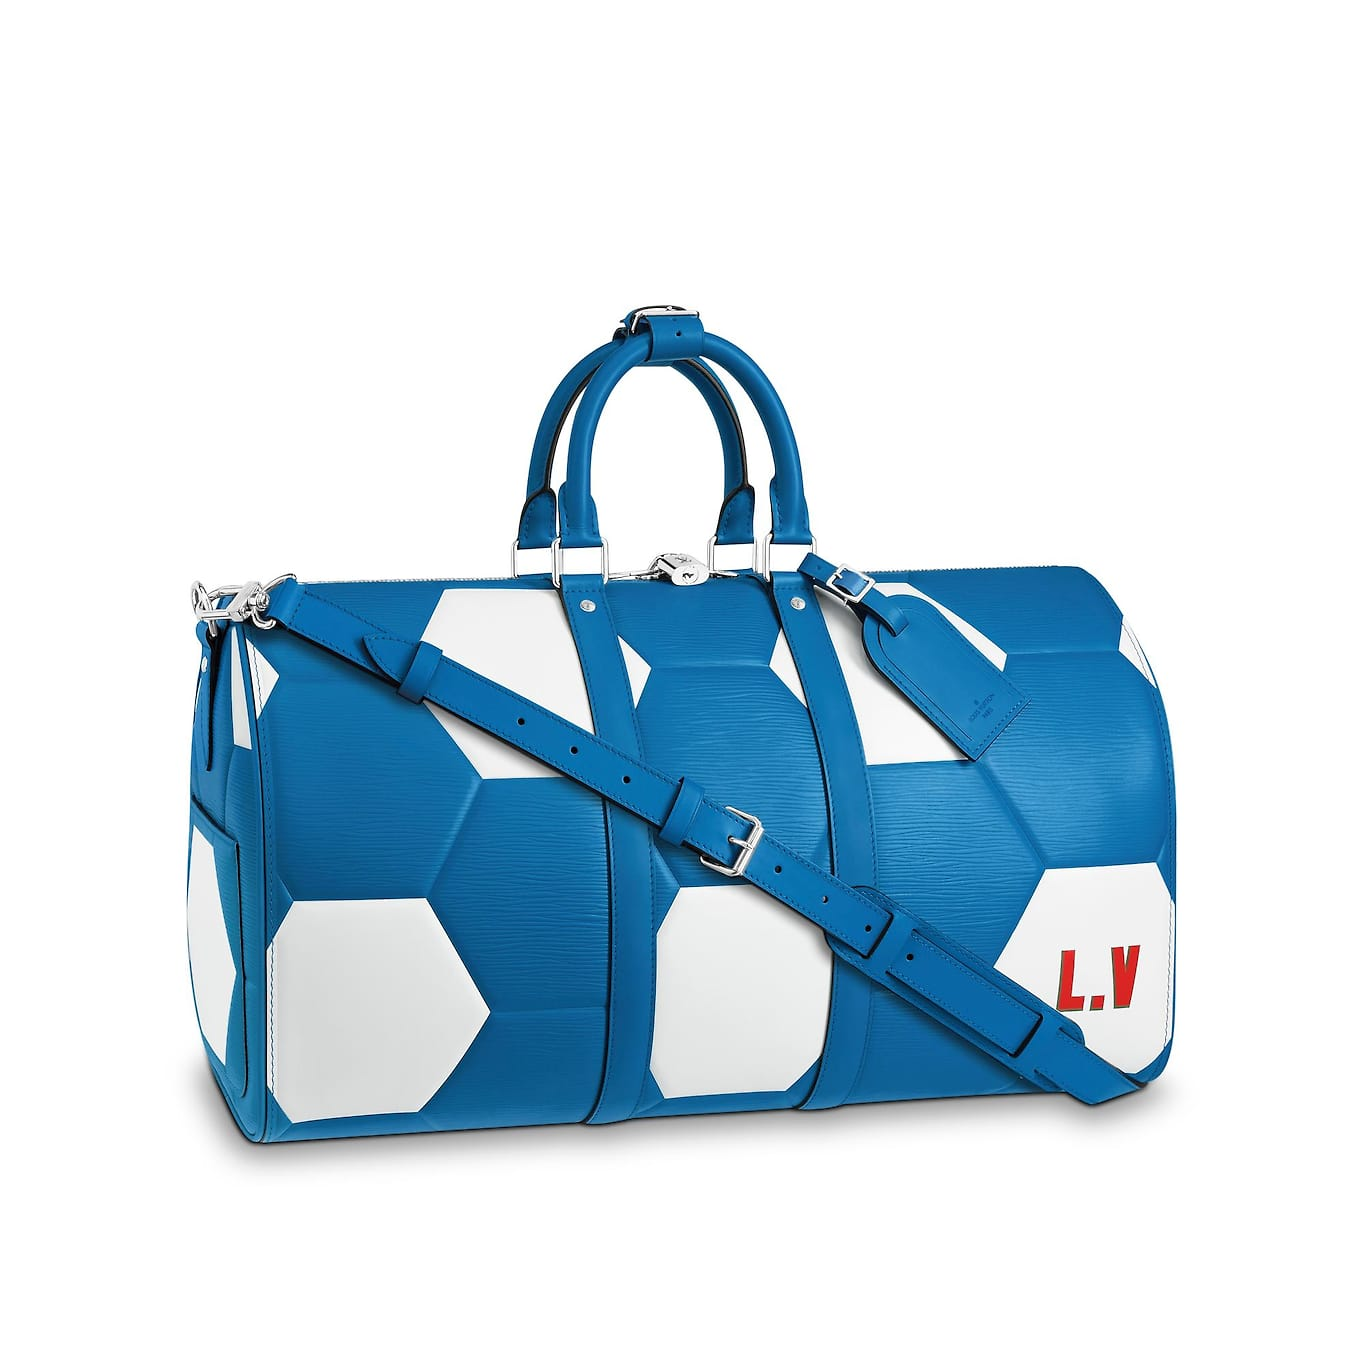 Louis Vuitton открыл поп-ап магазин в Крокус Сити Молл в Москве 2527aac7de4